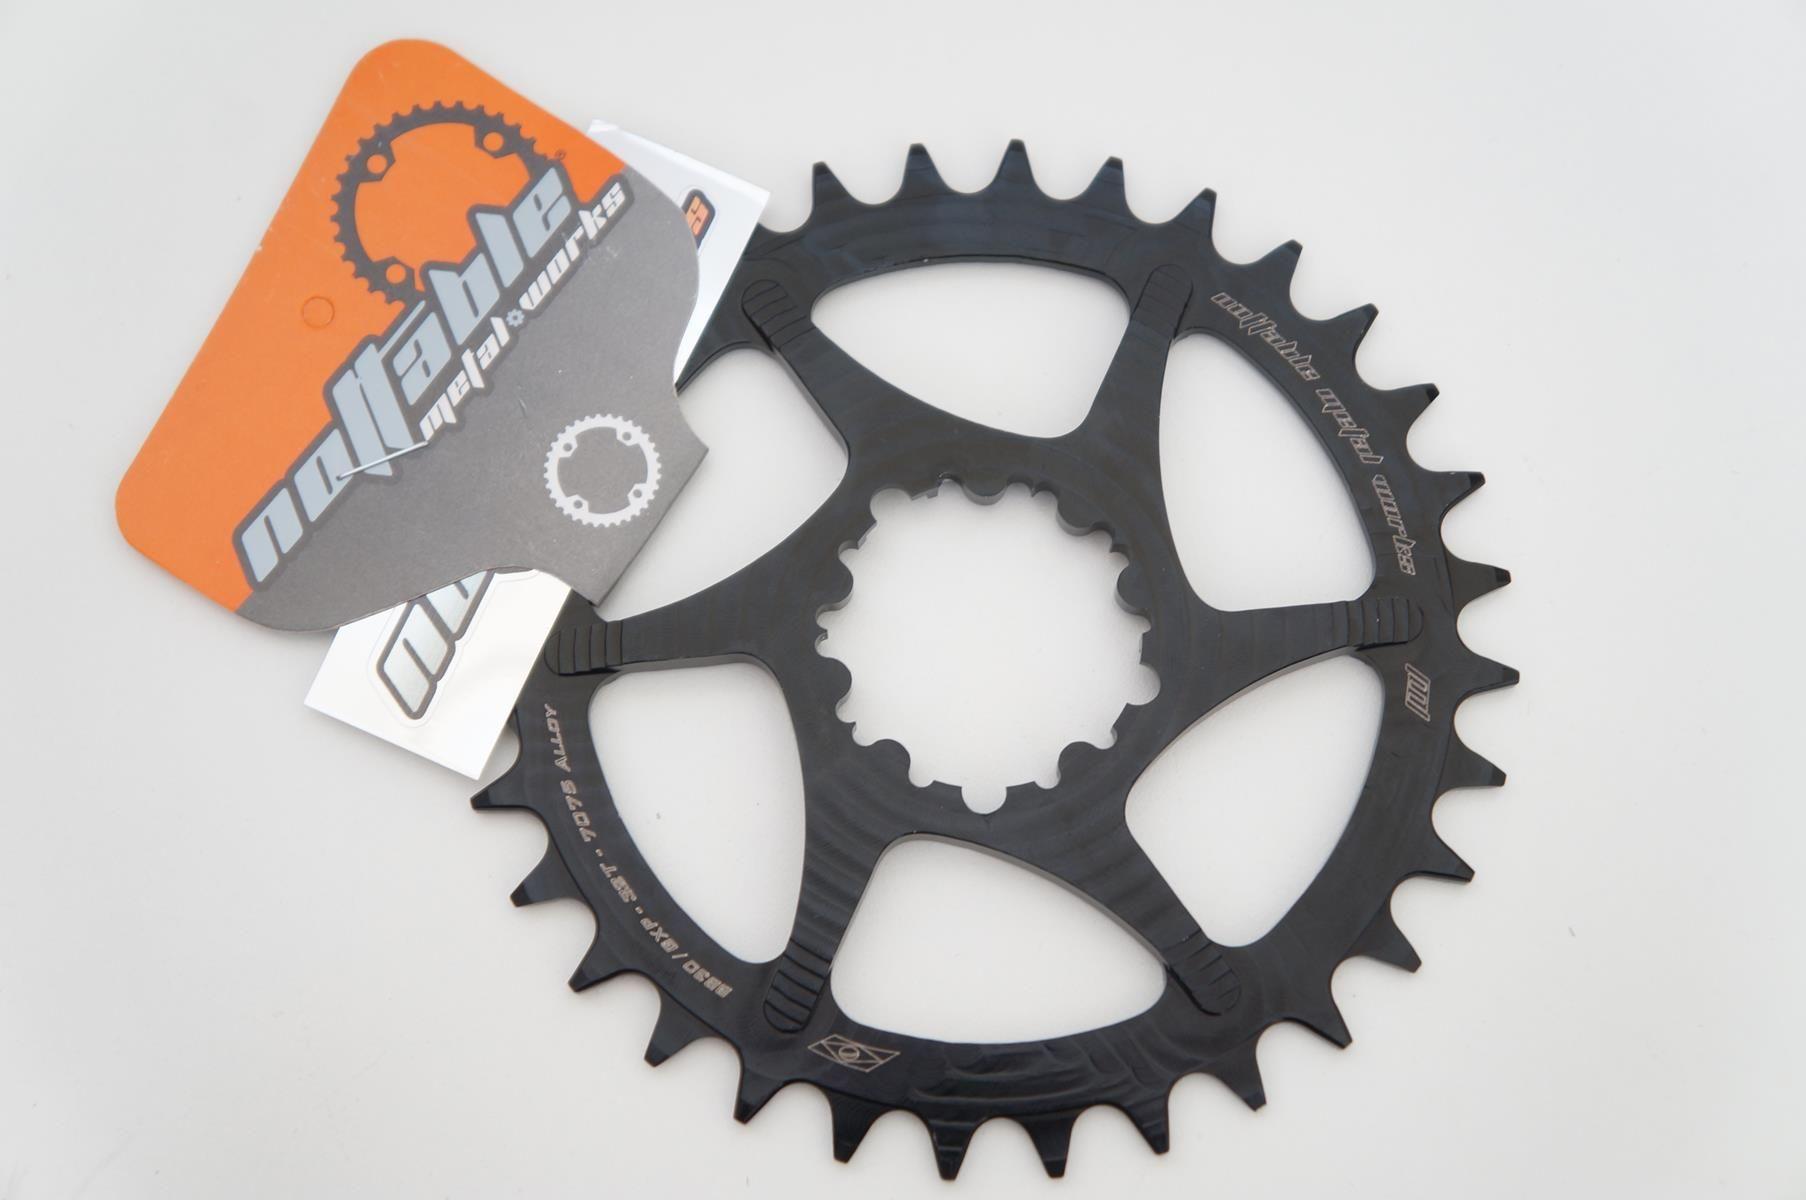 Coroa Bicicleta Nottable Sram 32t Direct Mount 3mm Off Set Boost Para Uso 1x11 1x12